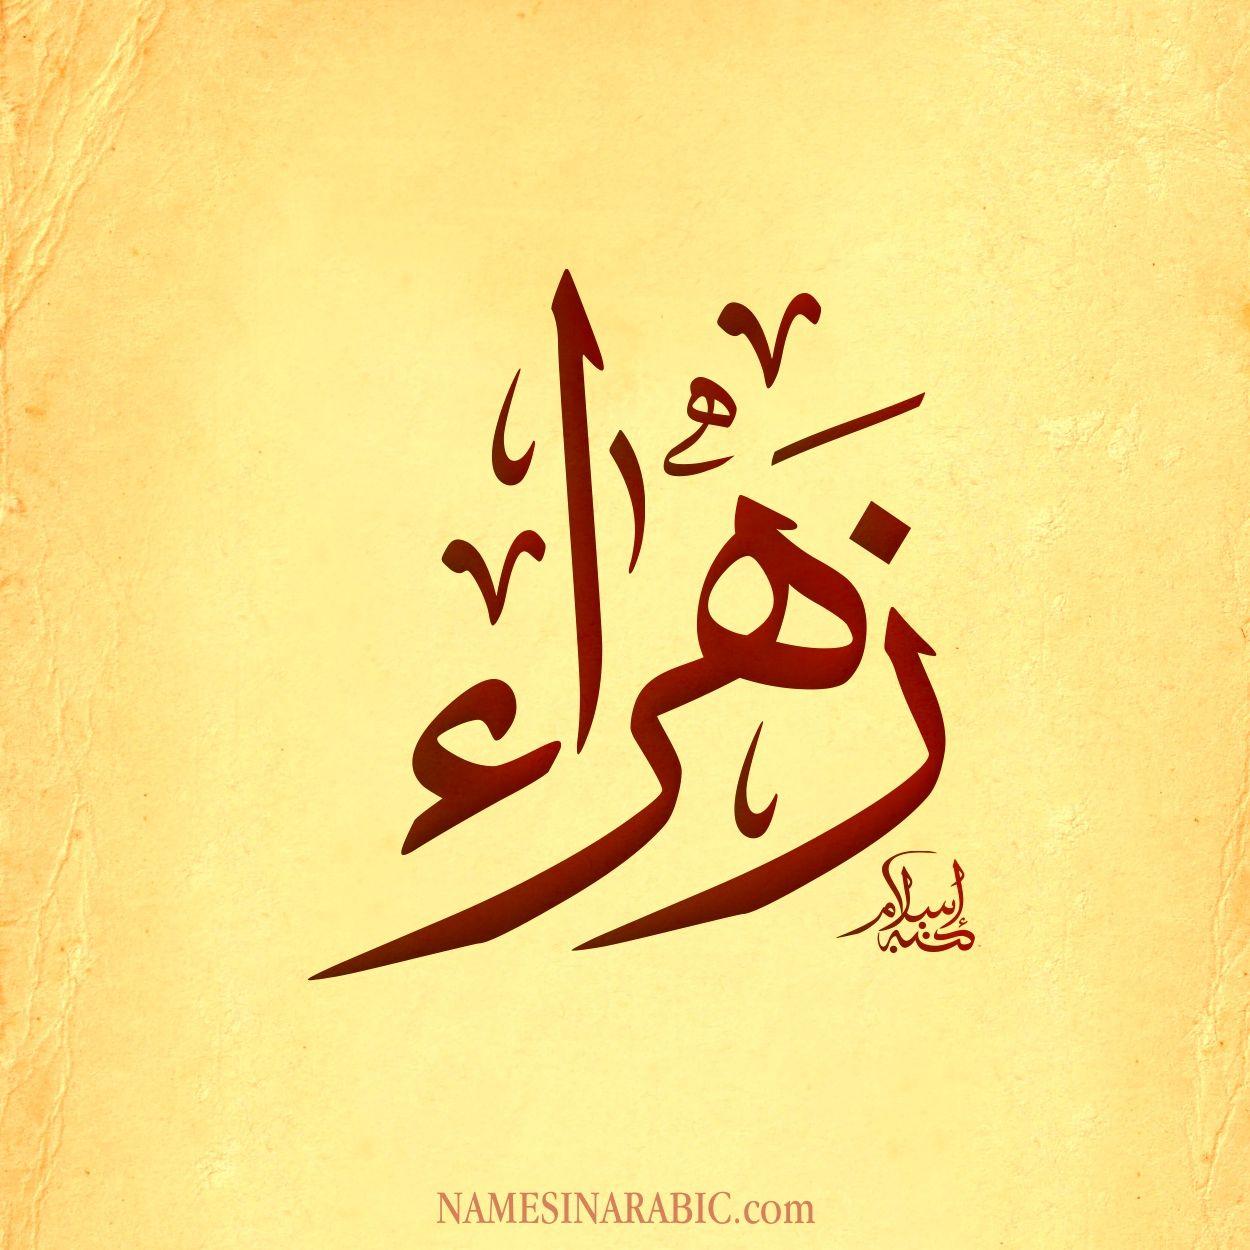 صور اسم زهراء ابرز الزخارف والنقوش لاسم زهراء 7383 3 Arabic Calligraphy Art Books